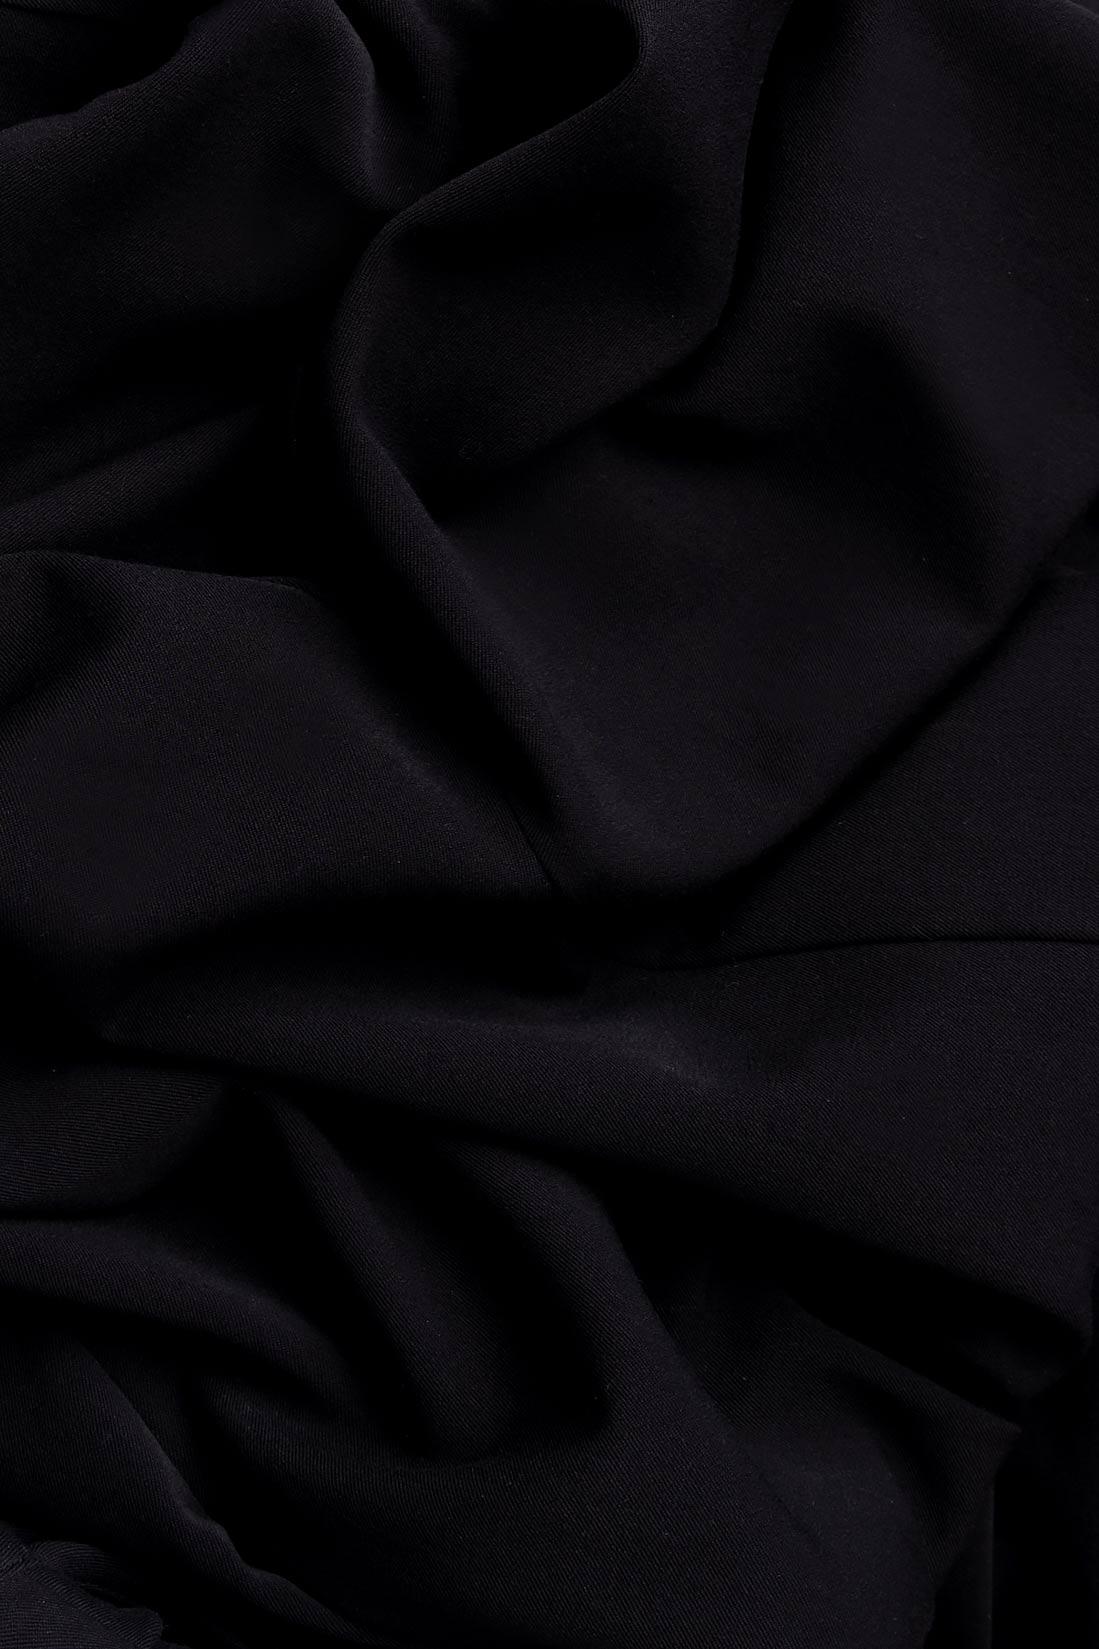 Salopeta din amestec de lana Arina Varga imagine 3